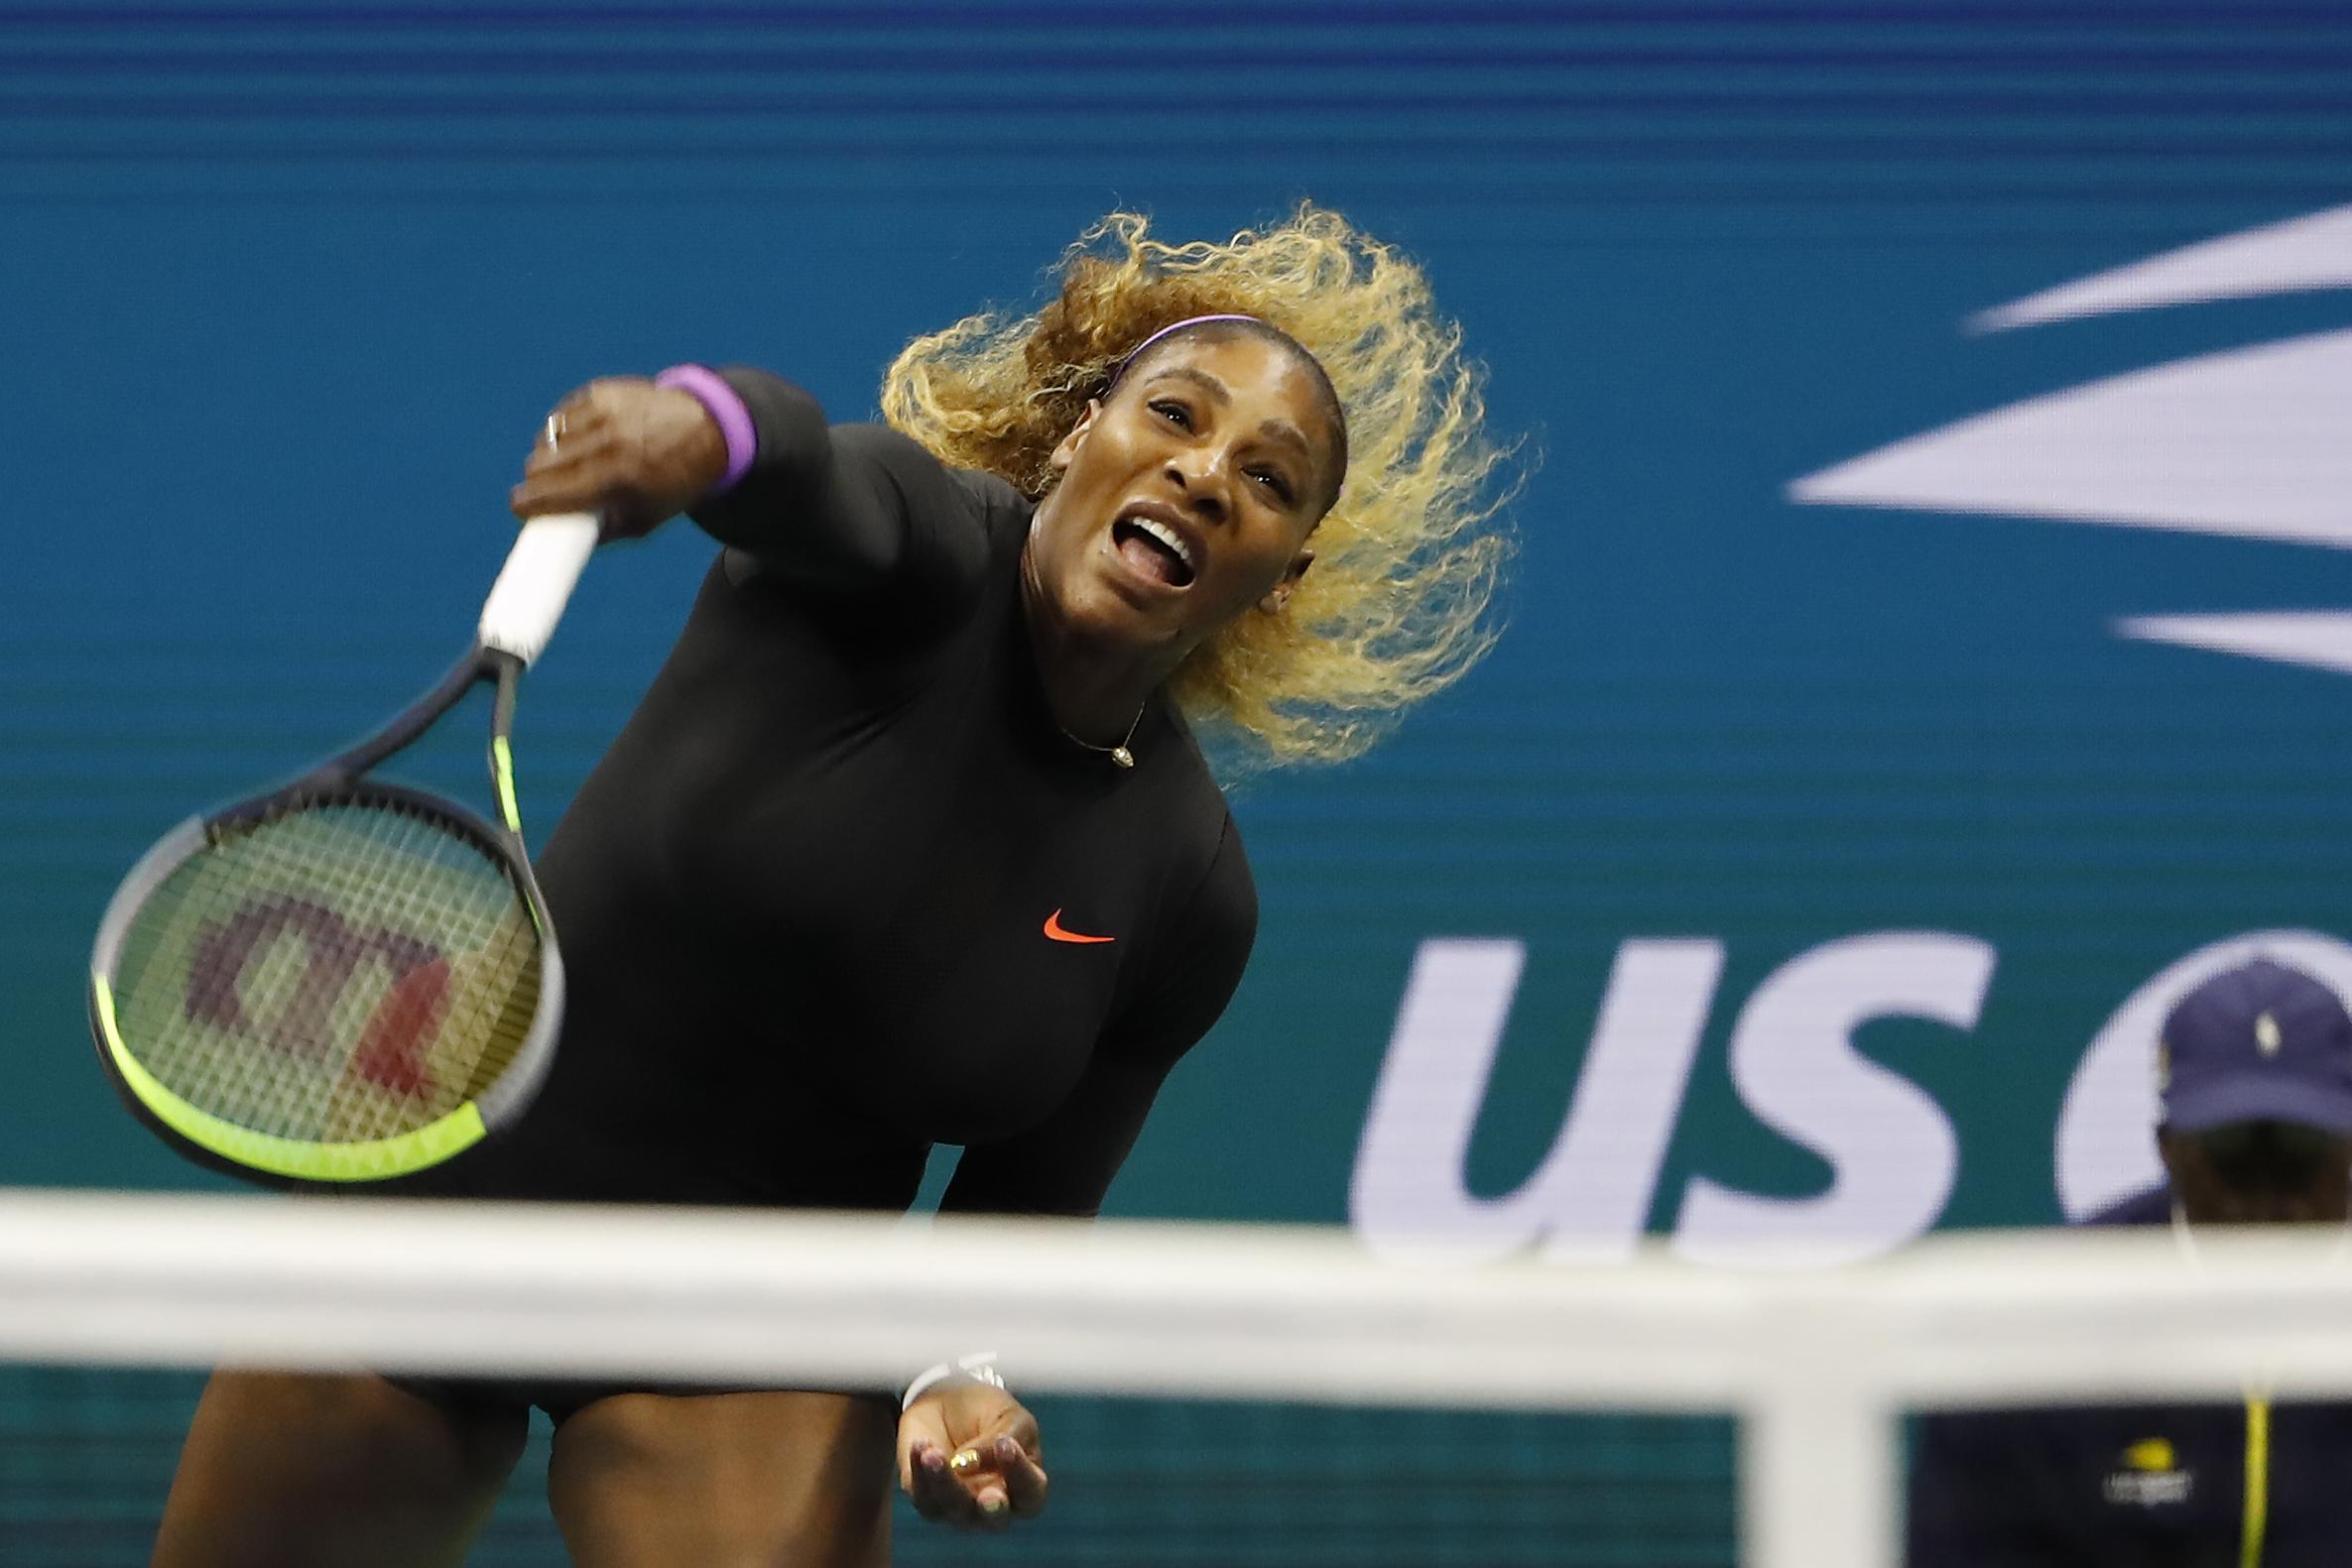 Serena Williams beats Maria Sharapova in a battle of the titans on the WTA Tour